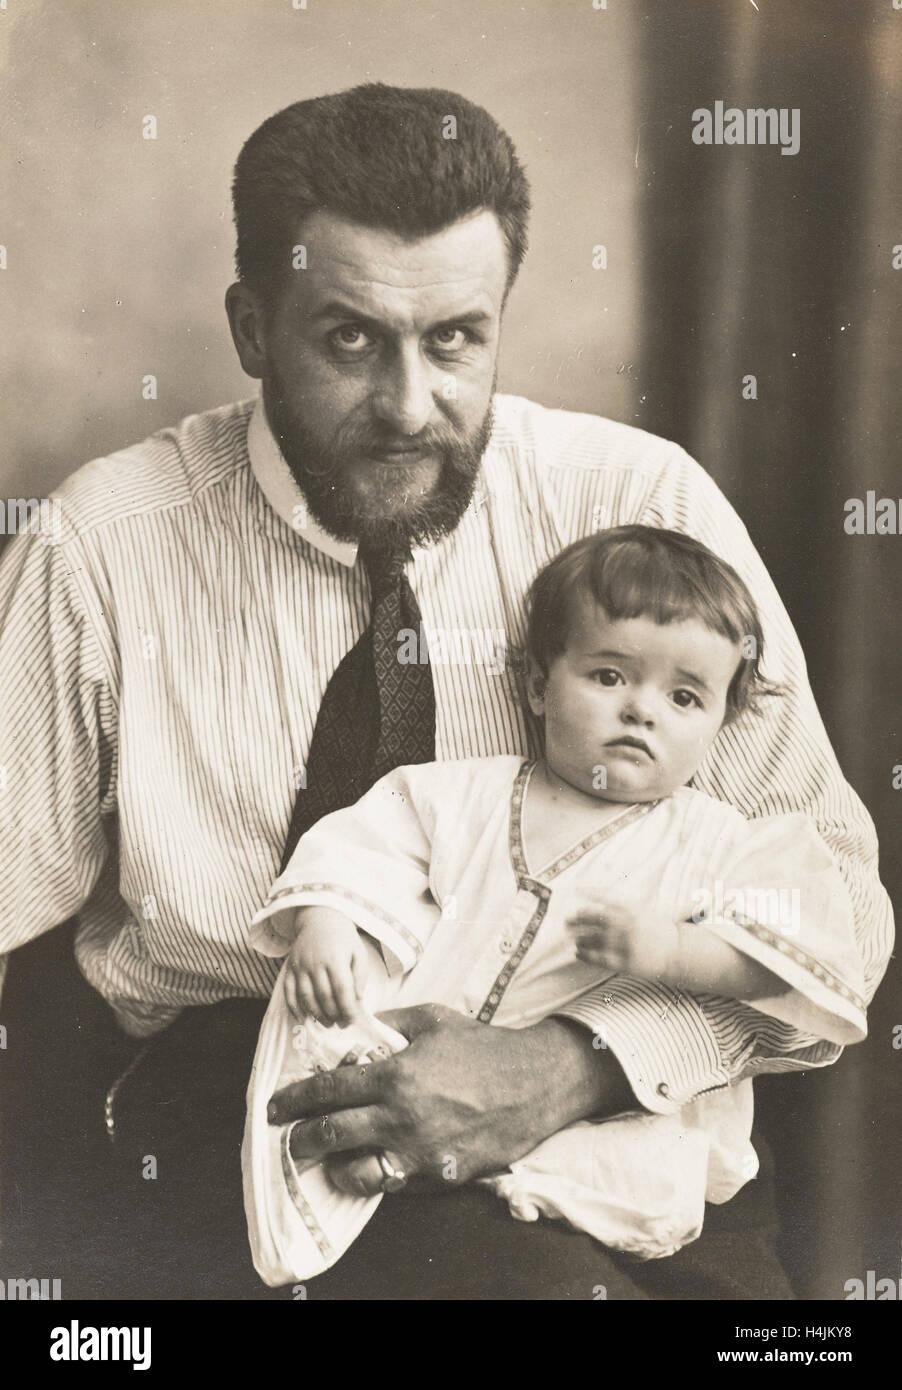 Waldemar Titzenthaler, the photographer, with his daughter Marba, Waldemar Titzenthaler, 1869 - 1937, 1912 - Stock Image